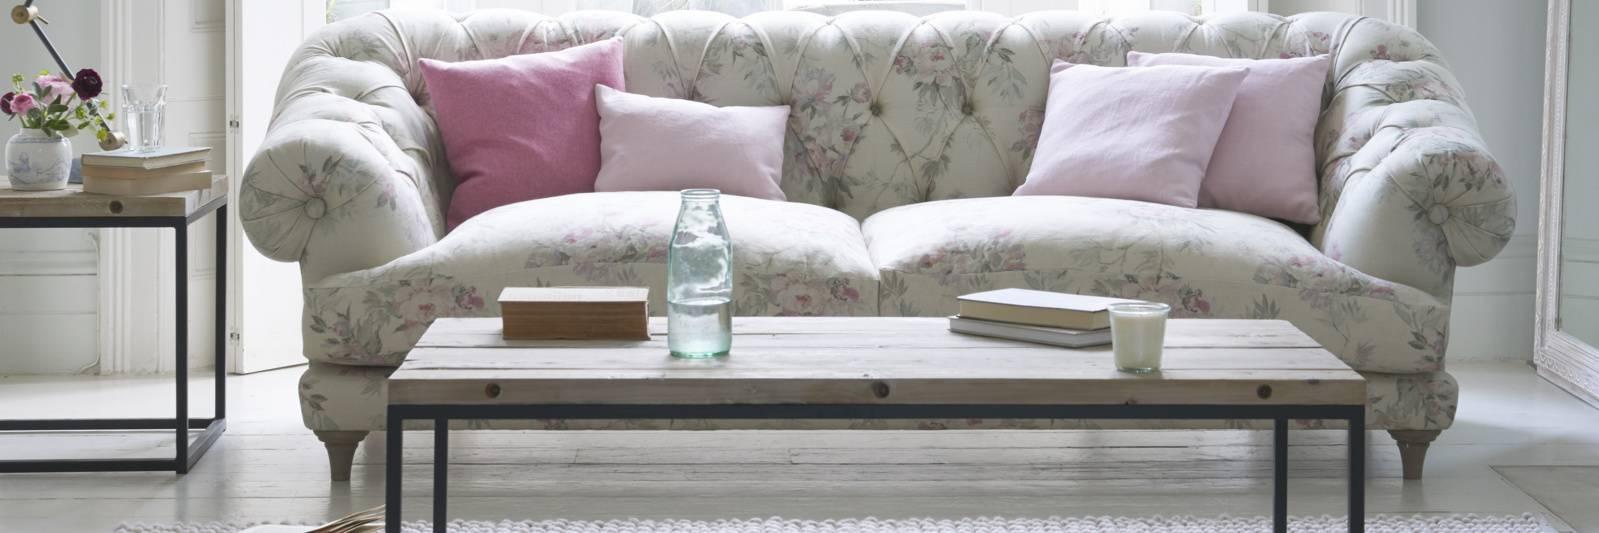 Floral Sofas | Sofas Decoration regarding Chintz Floral Sofas (Image 24 of 30)